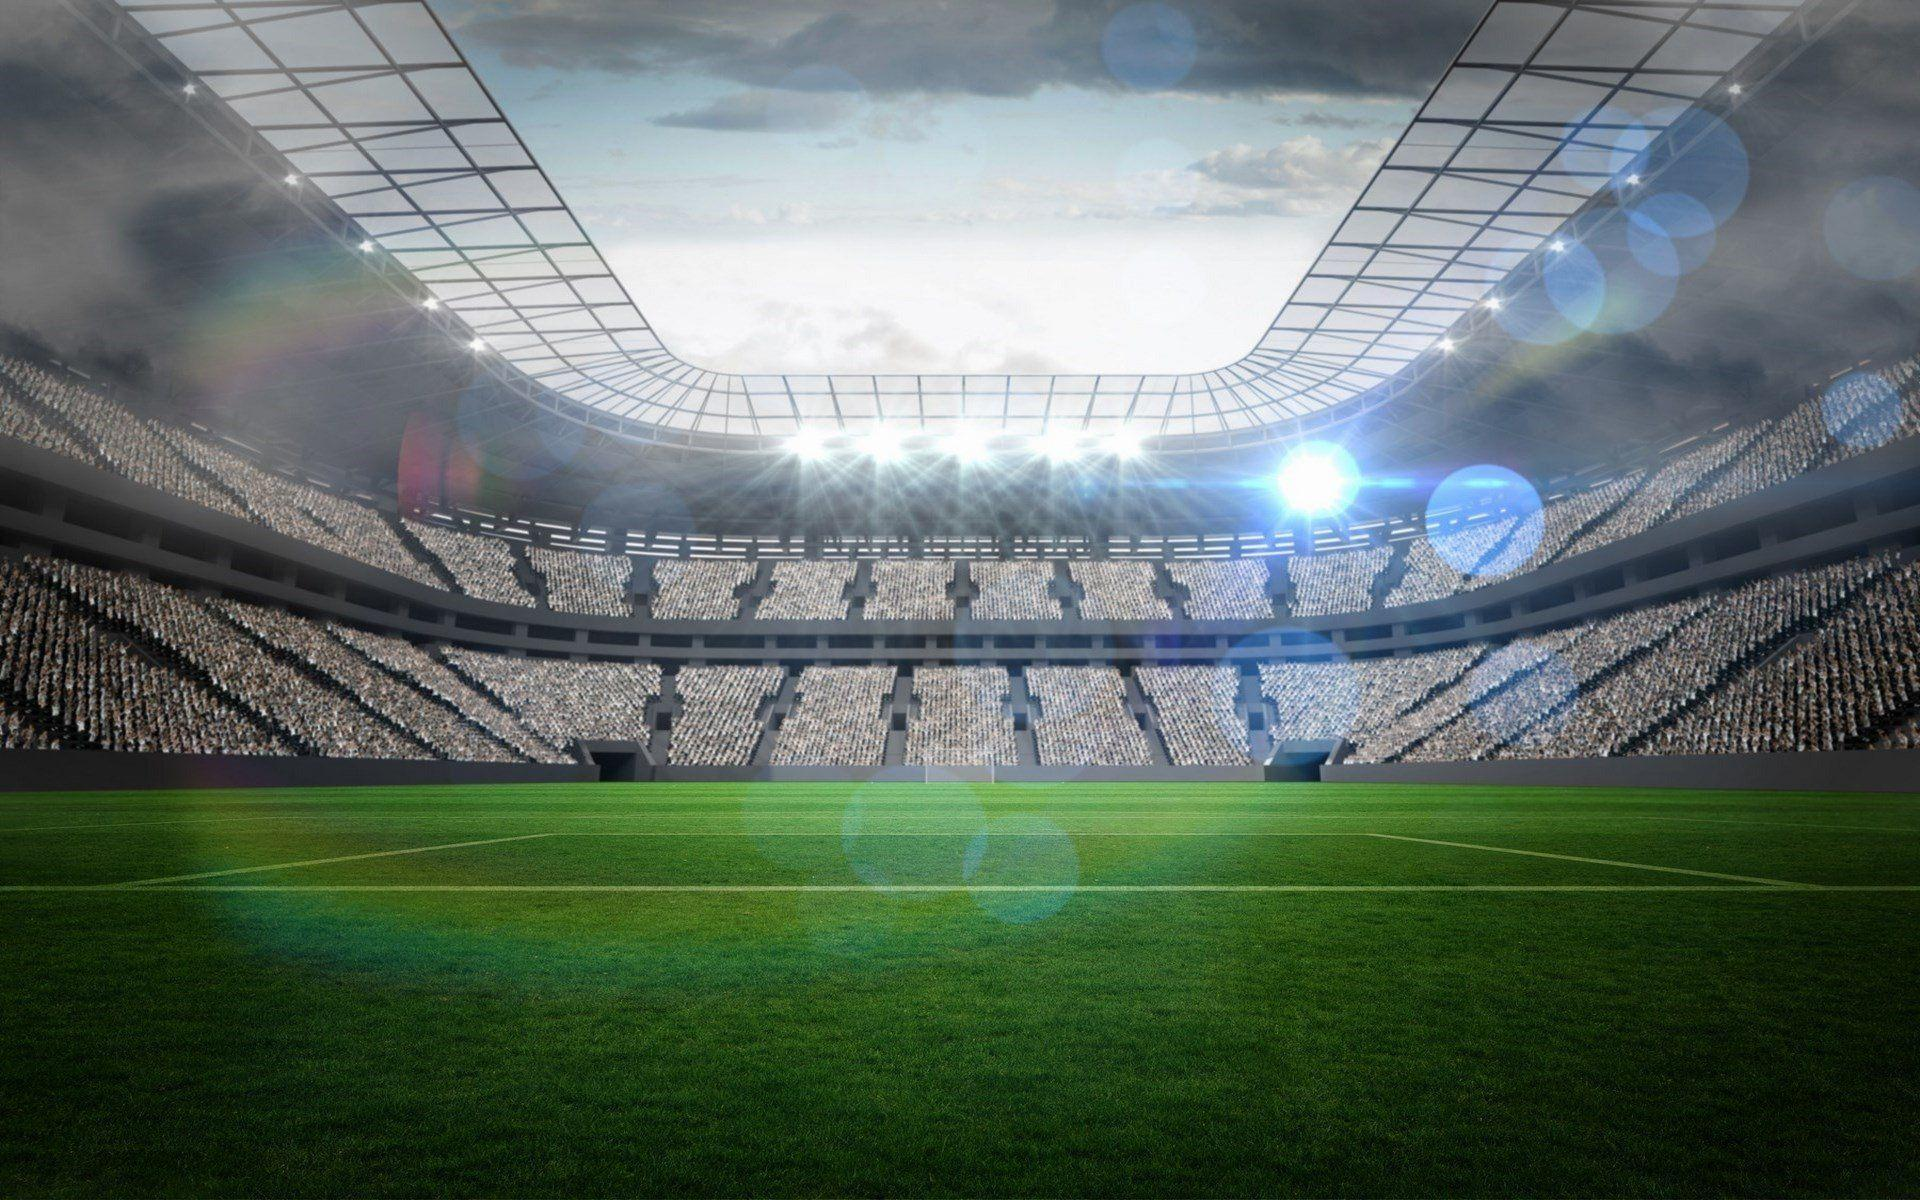 football stadium hd wallpapers wallpaper cave football stadium hd wallpapers